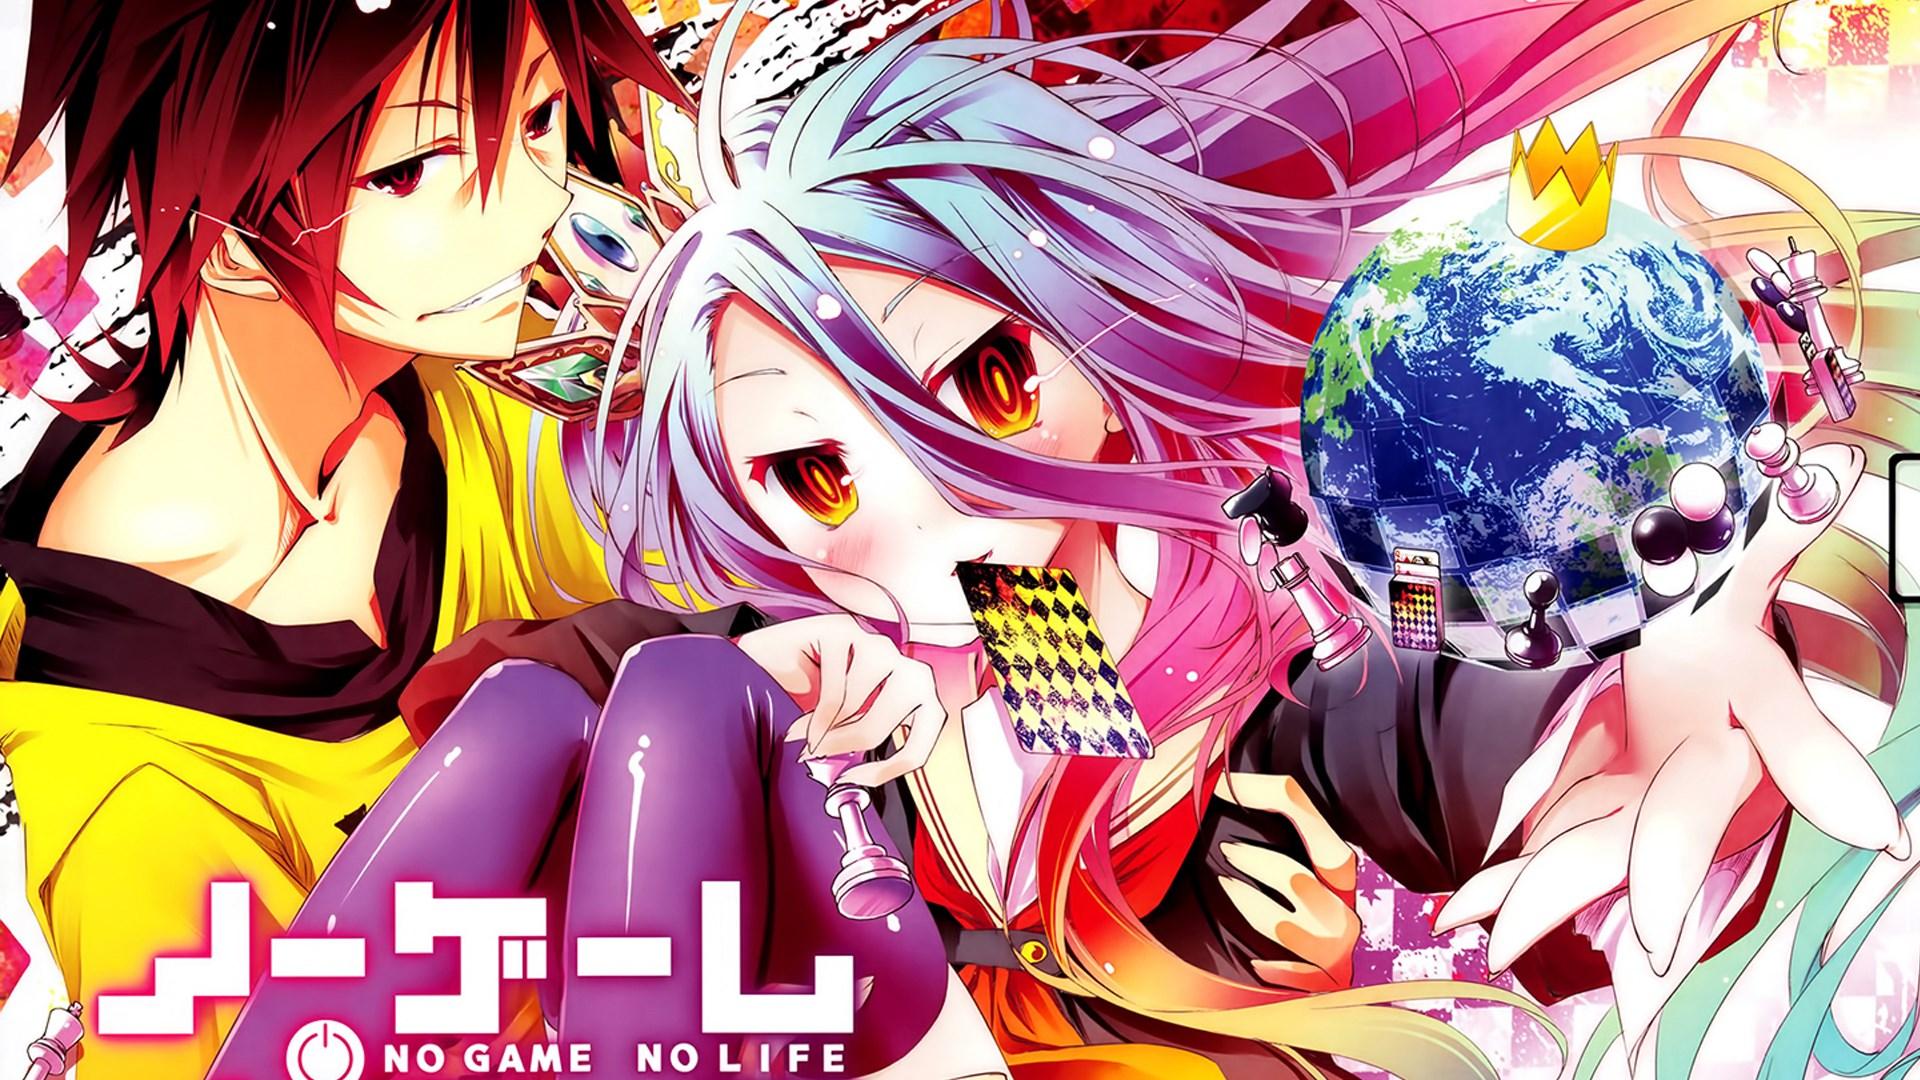 http://blog-imgs-65.fc2.com/d/g/d/dgdg875/anime_wallpaper_No_Game_No_Life_shiro_sora_01888292.jpg